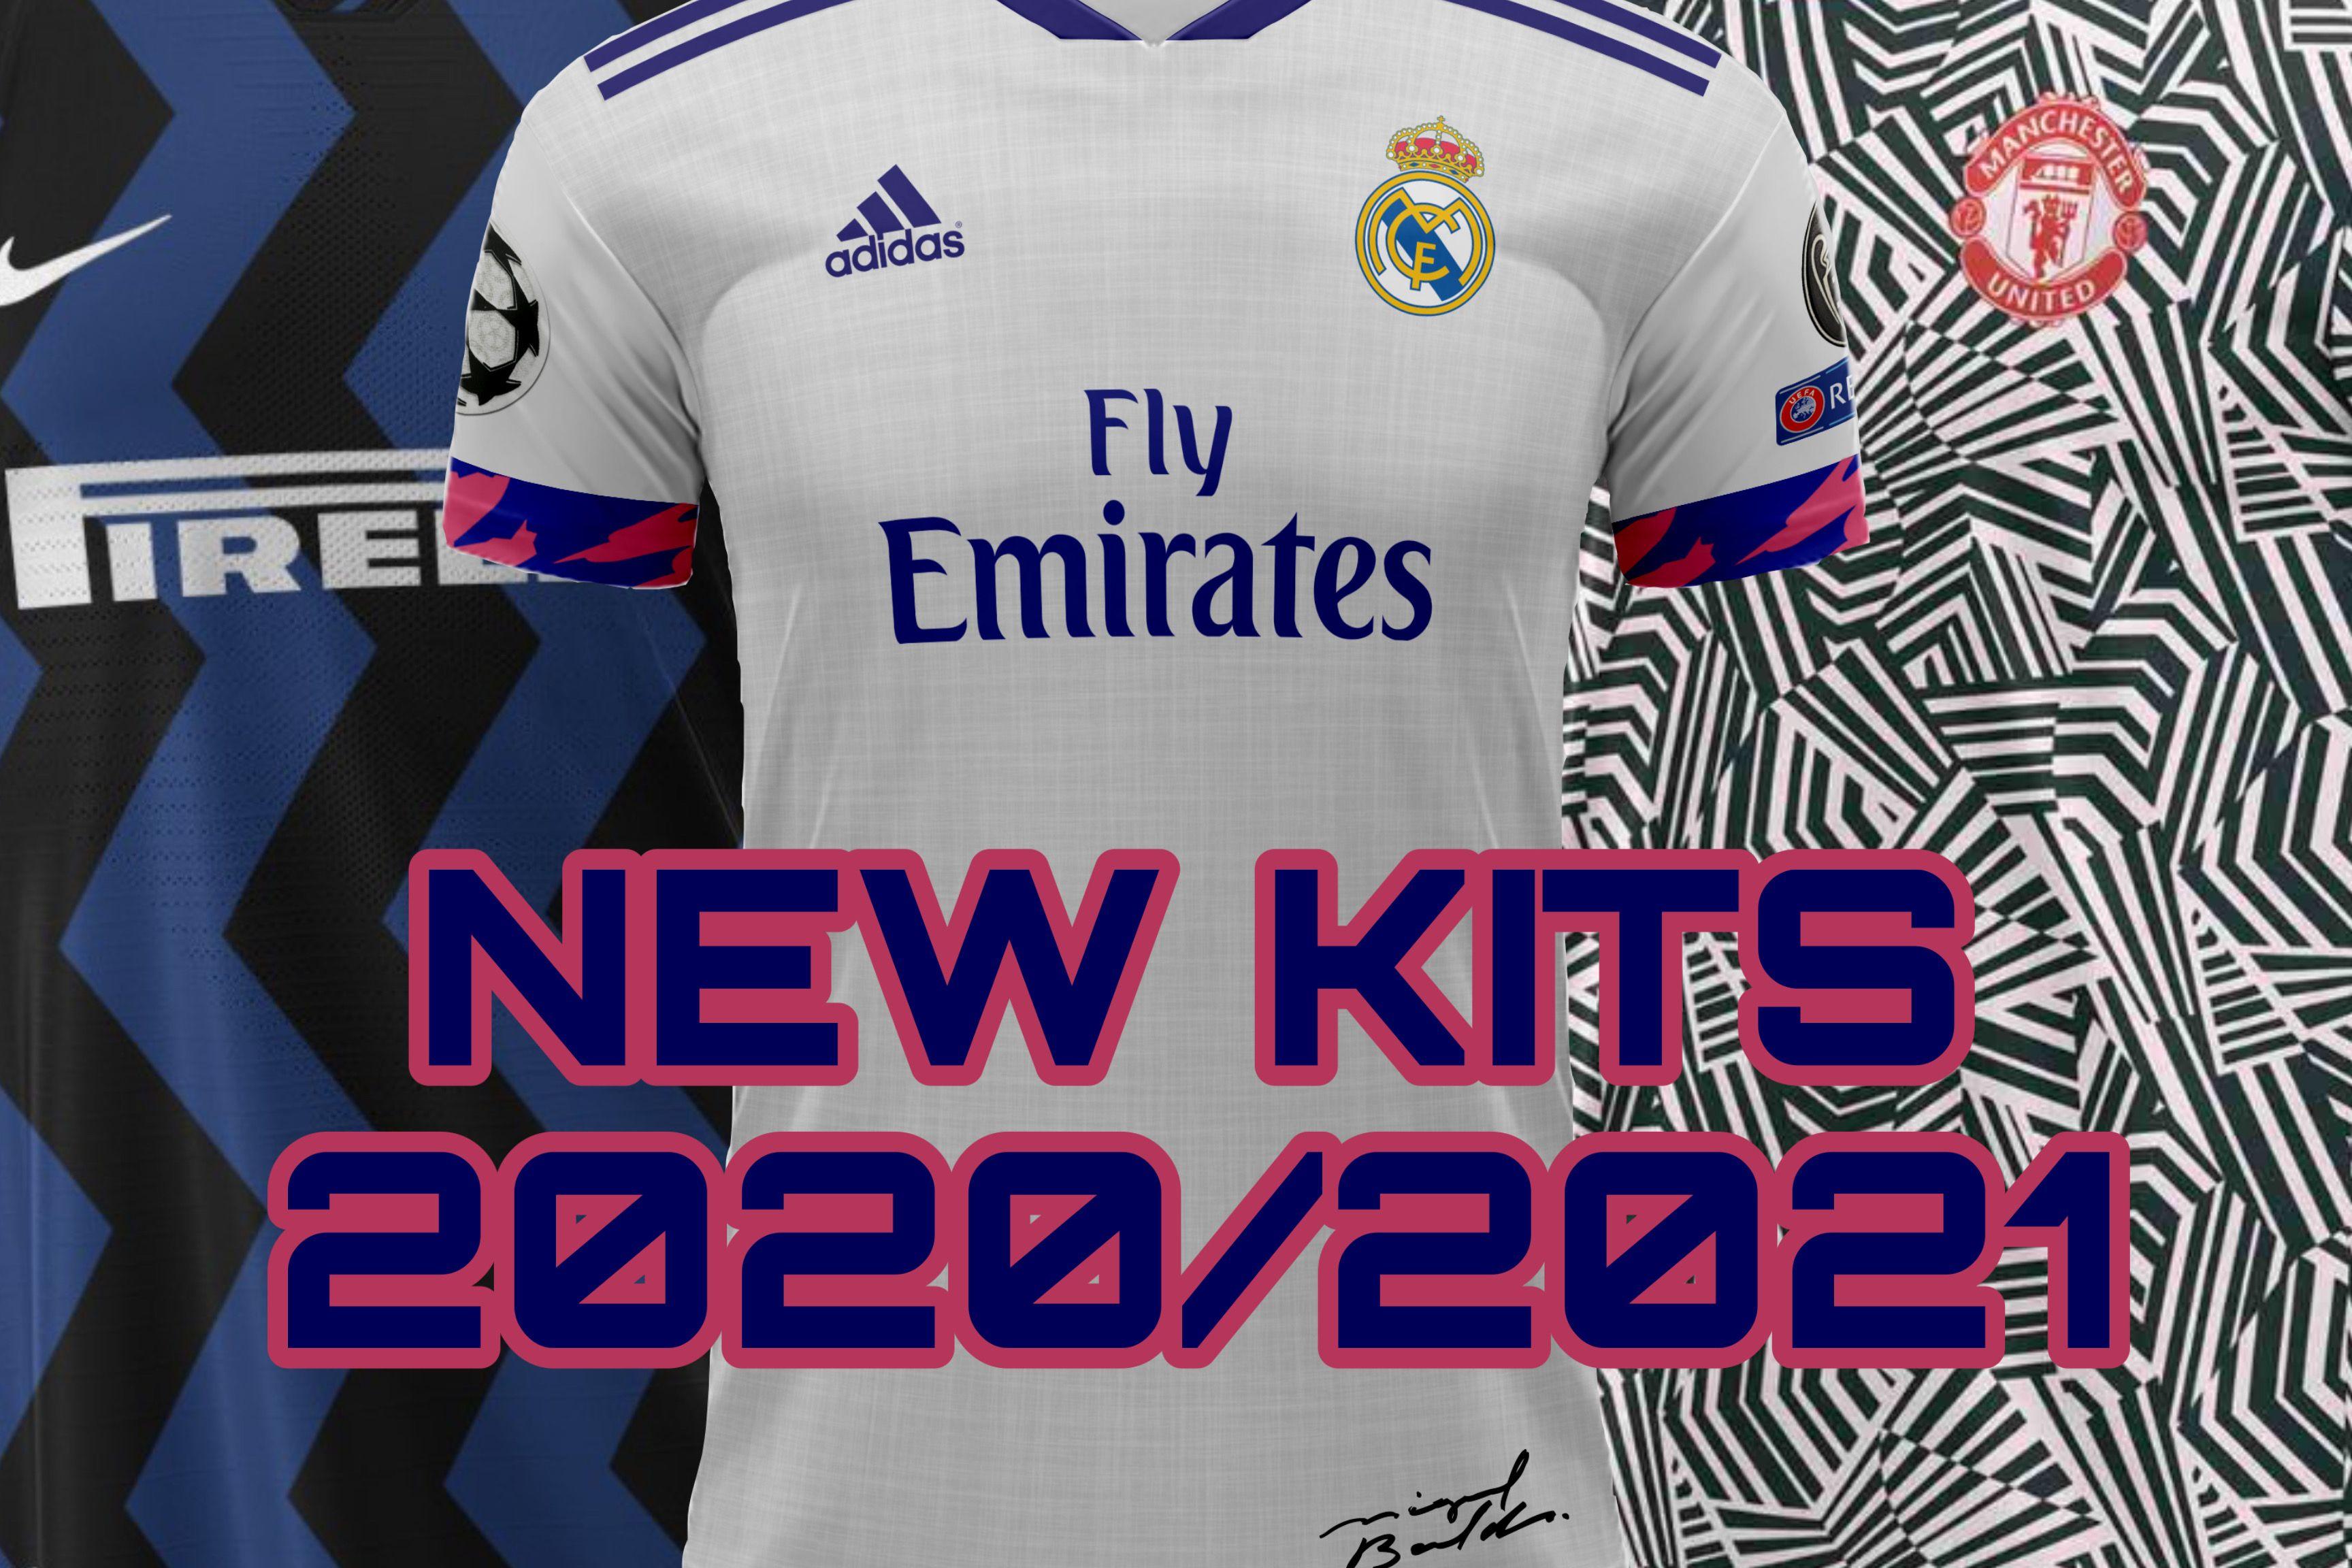 All New Football Kits 2020 2021 Football Kits Real Madrid Football